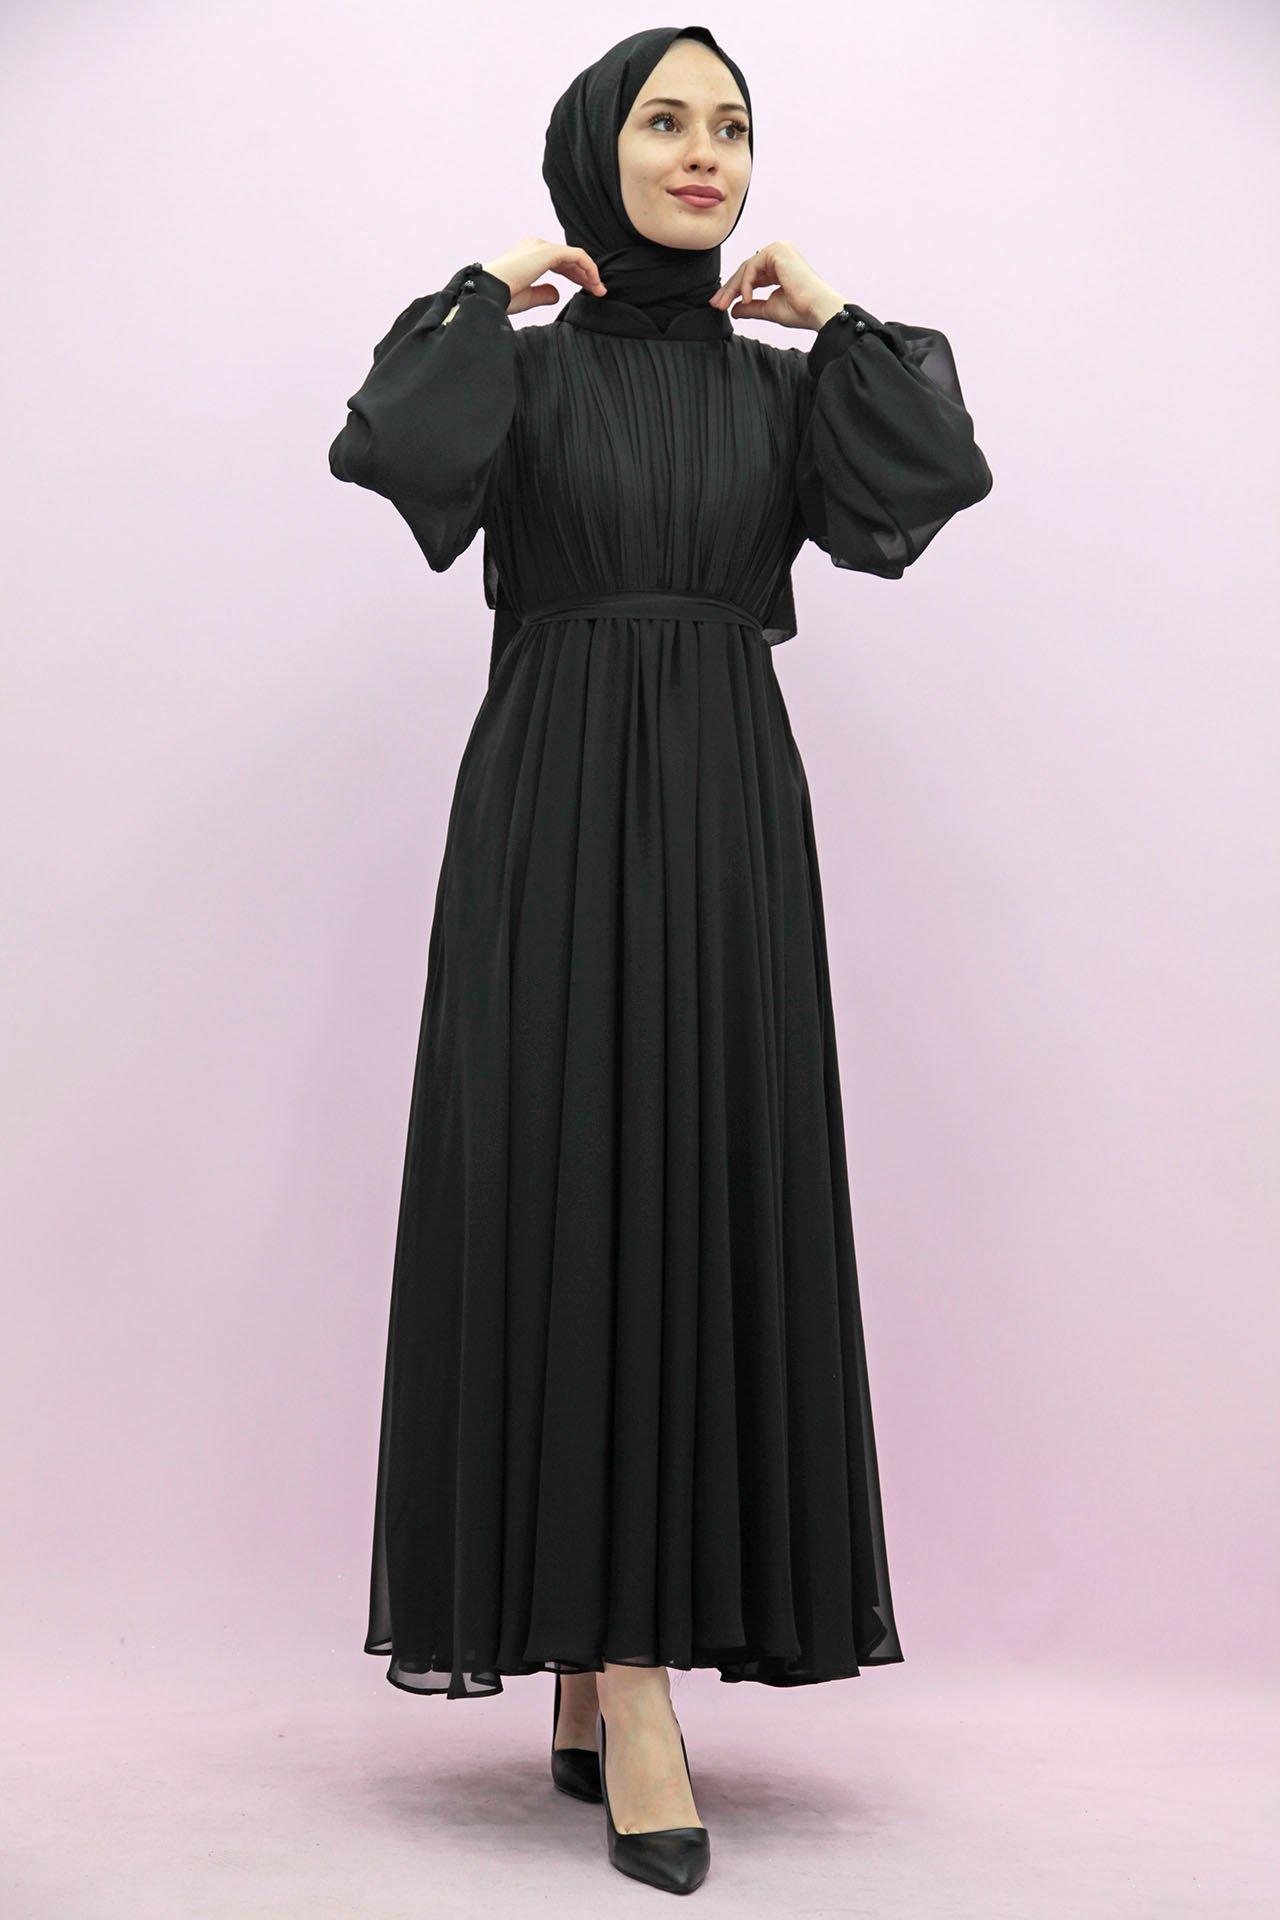 GİZAGİYİM - Kuyruklu Pilisoley Şifon Elbise Siyah